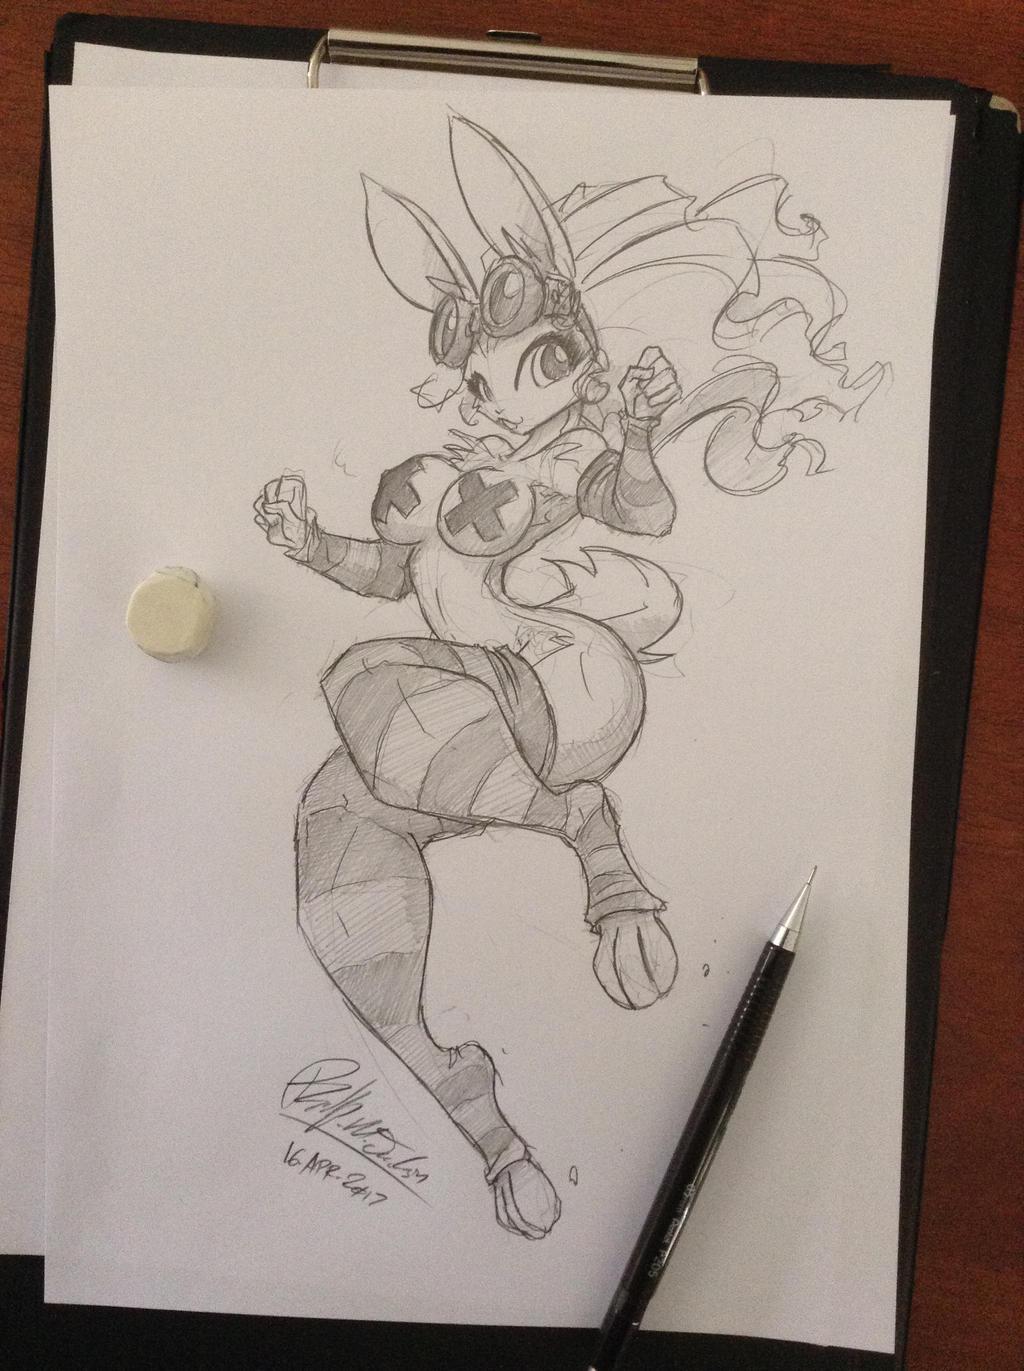 Hot Cross Bunny by jollyjack